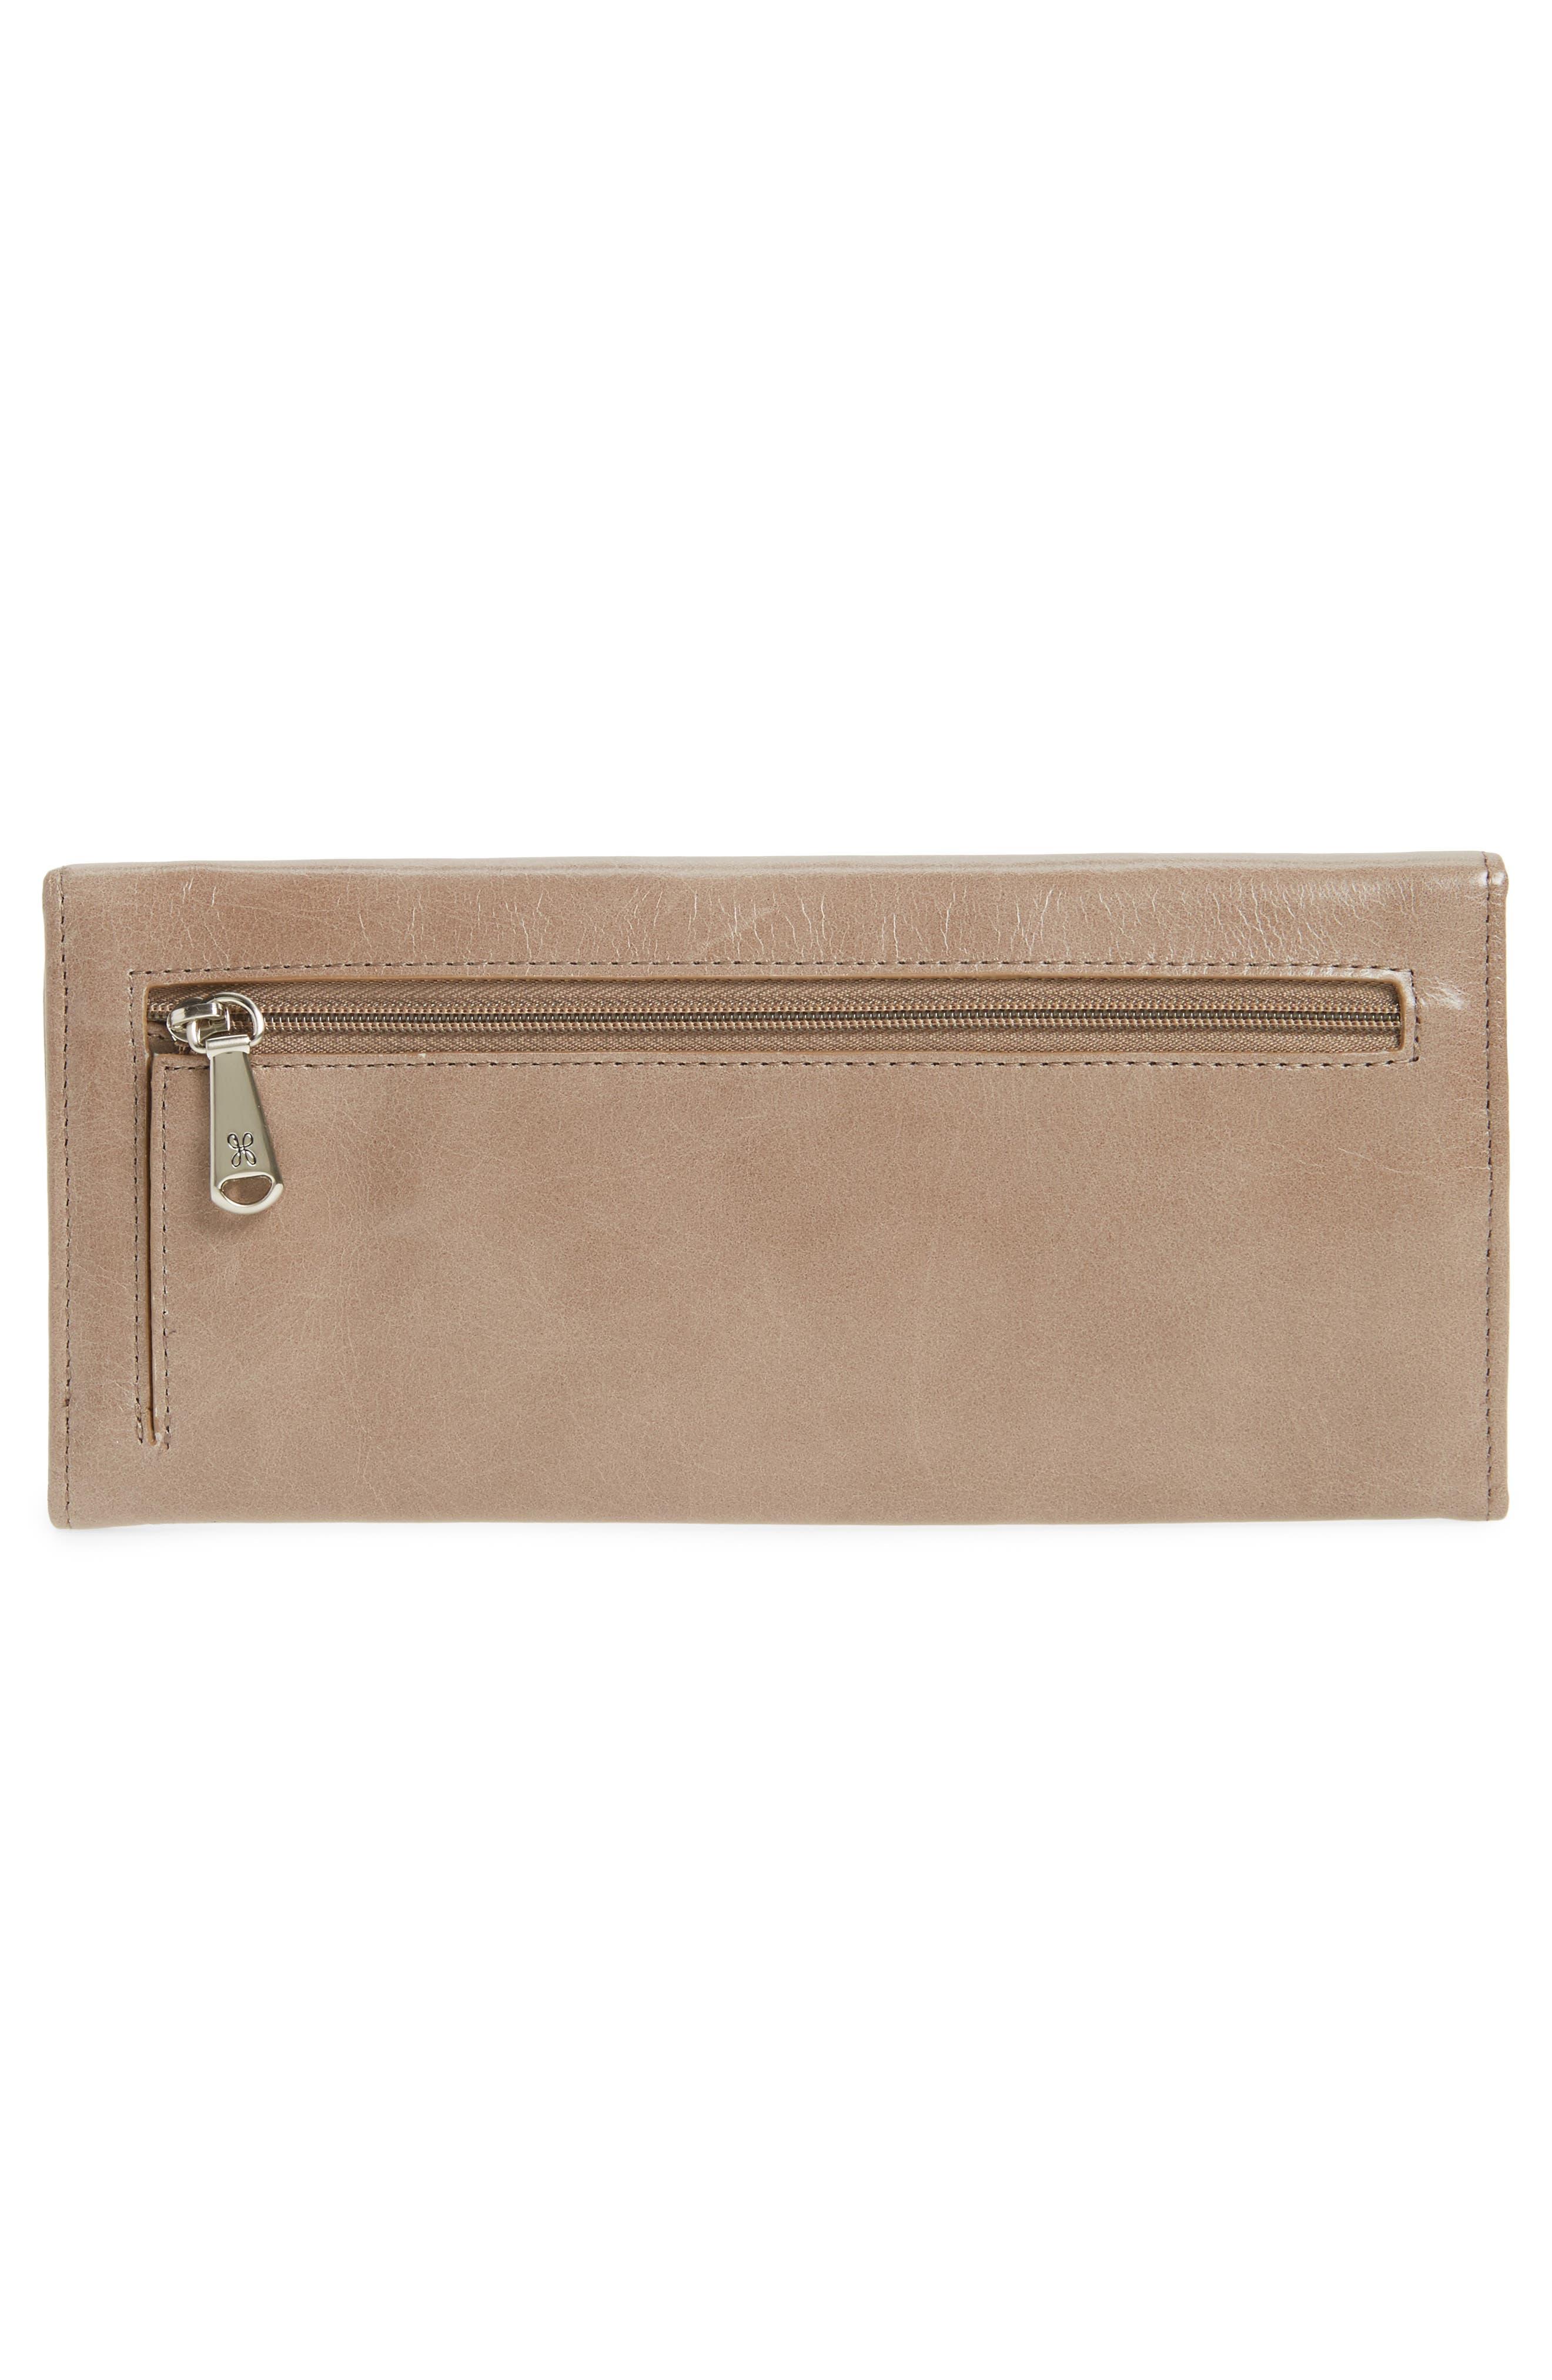 'Sadie' Leather Wallet,                             Alternate thumbnail 103, color,